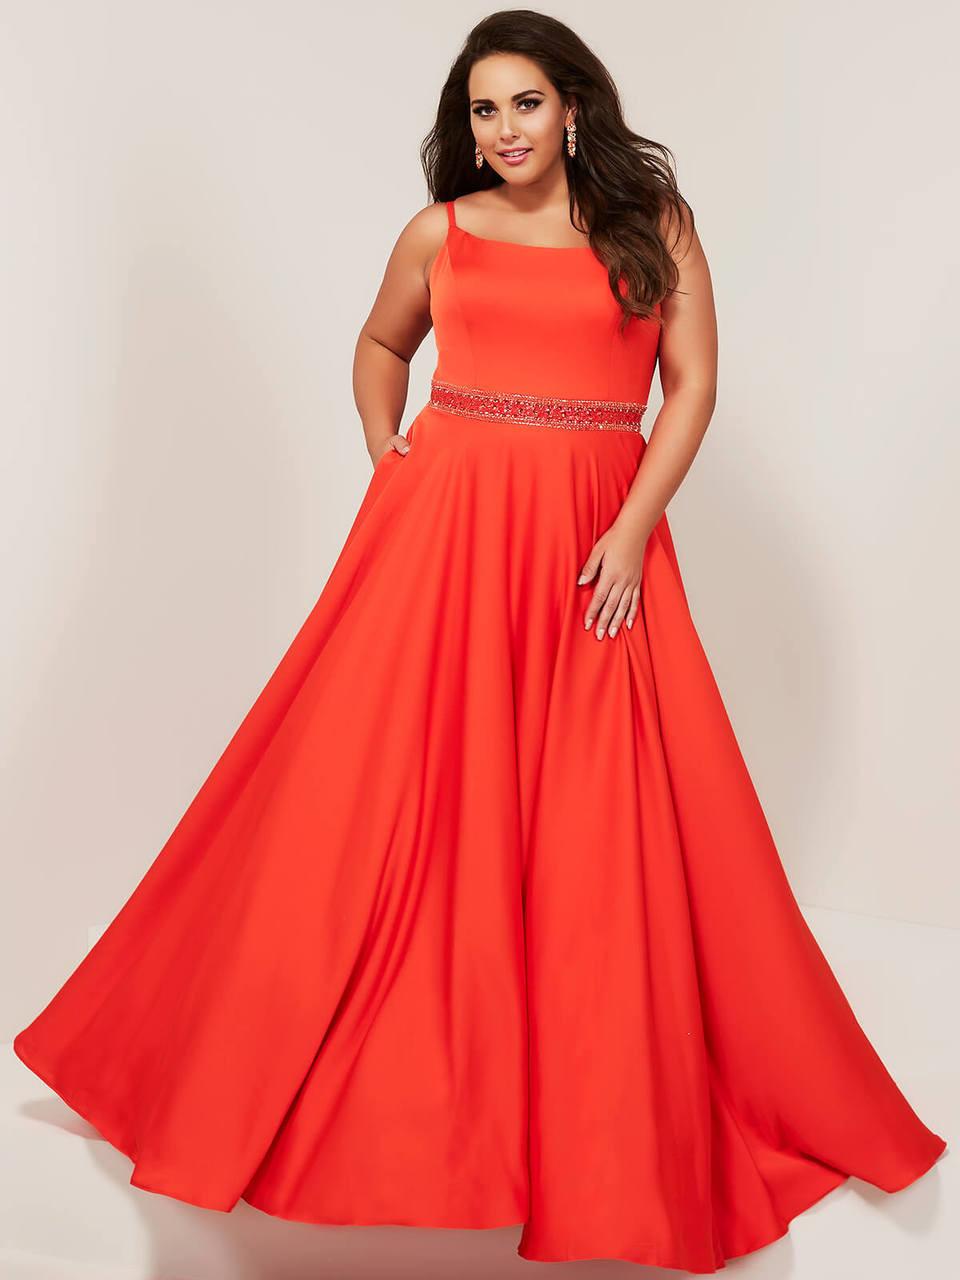 Scoop Neckline A-line Tiffany Designs 16383 Plus Size Prom Dress ...